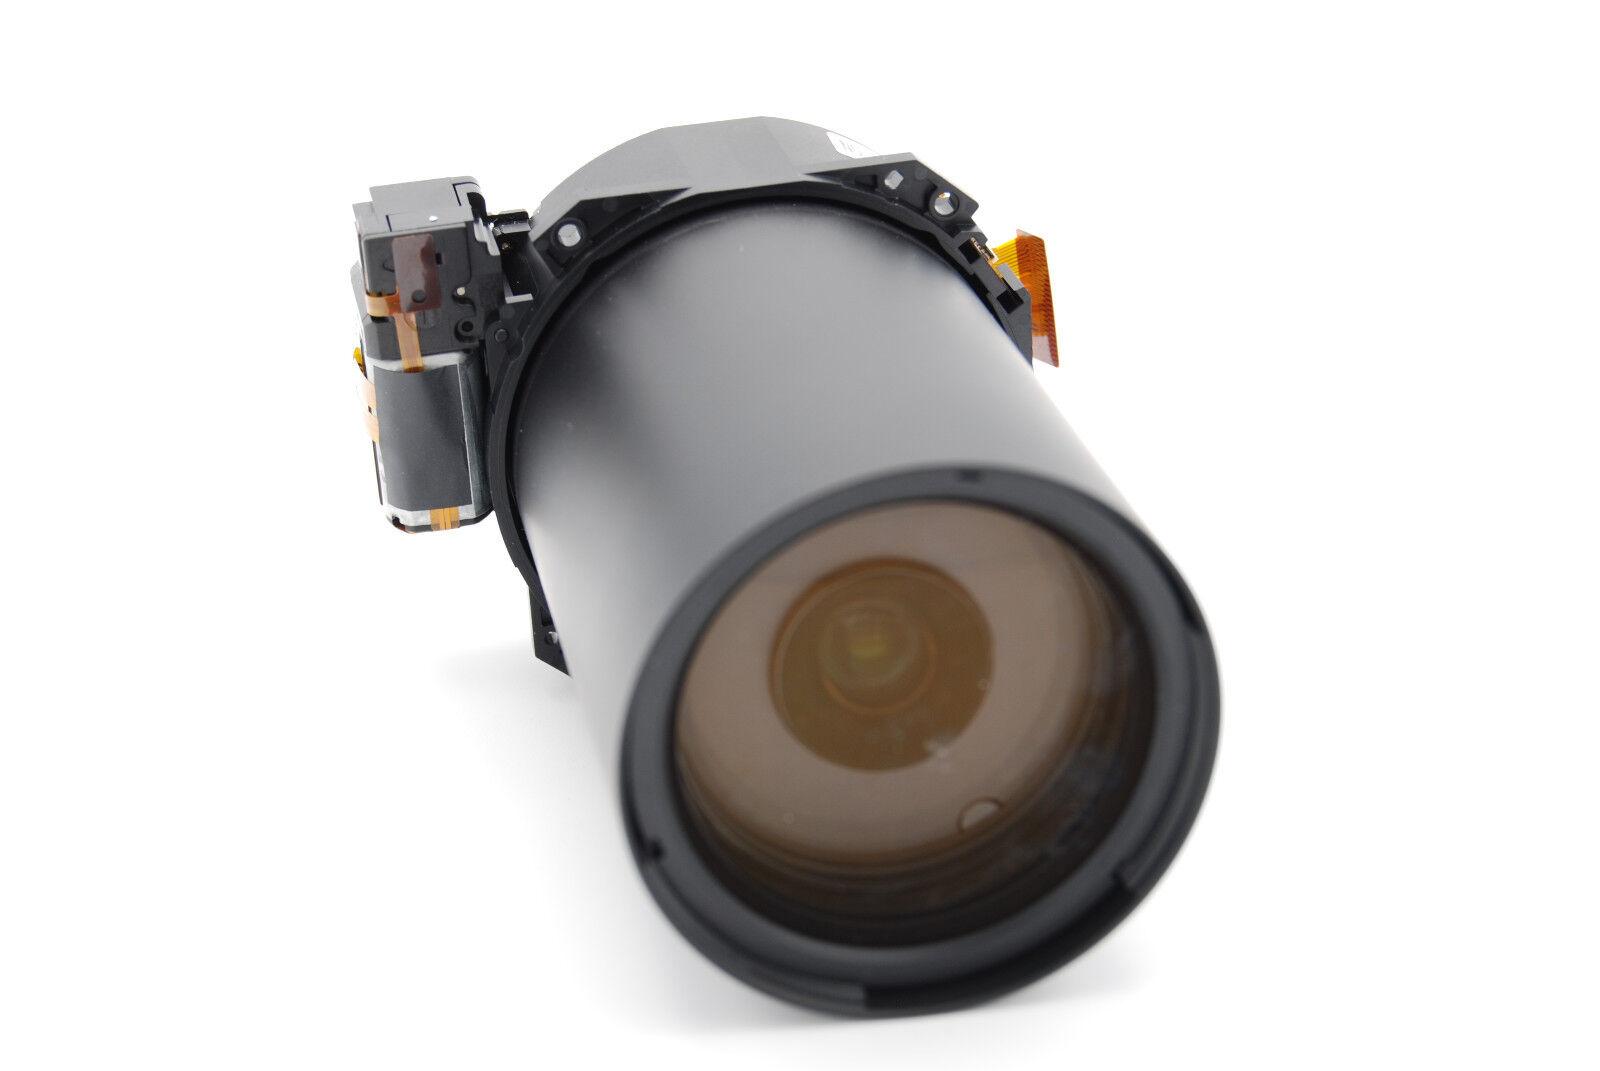 Lens Zoom For Nikon Coolpix P900 P900s Digital Camera Rep...